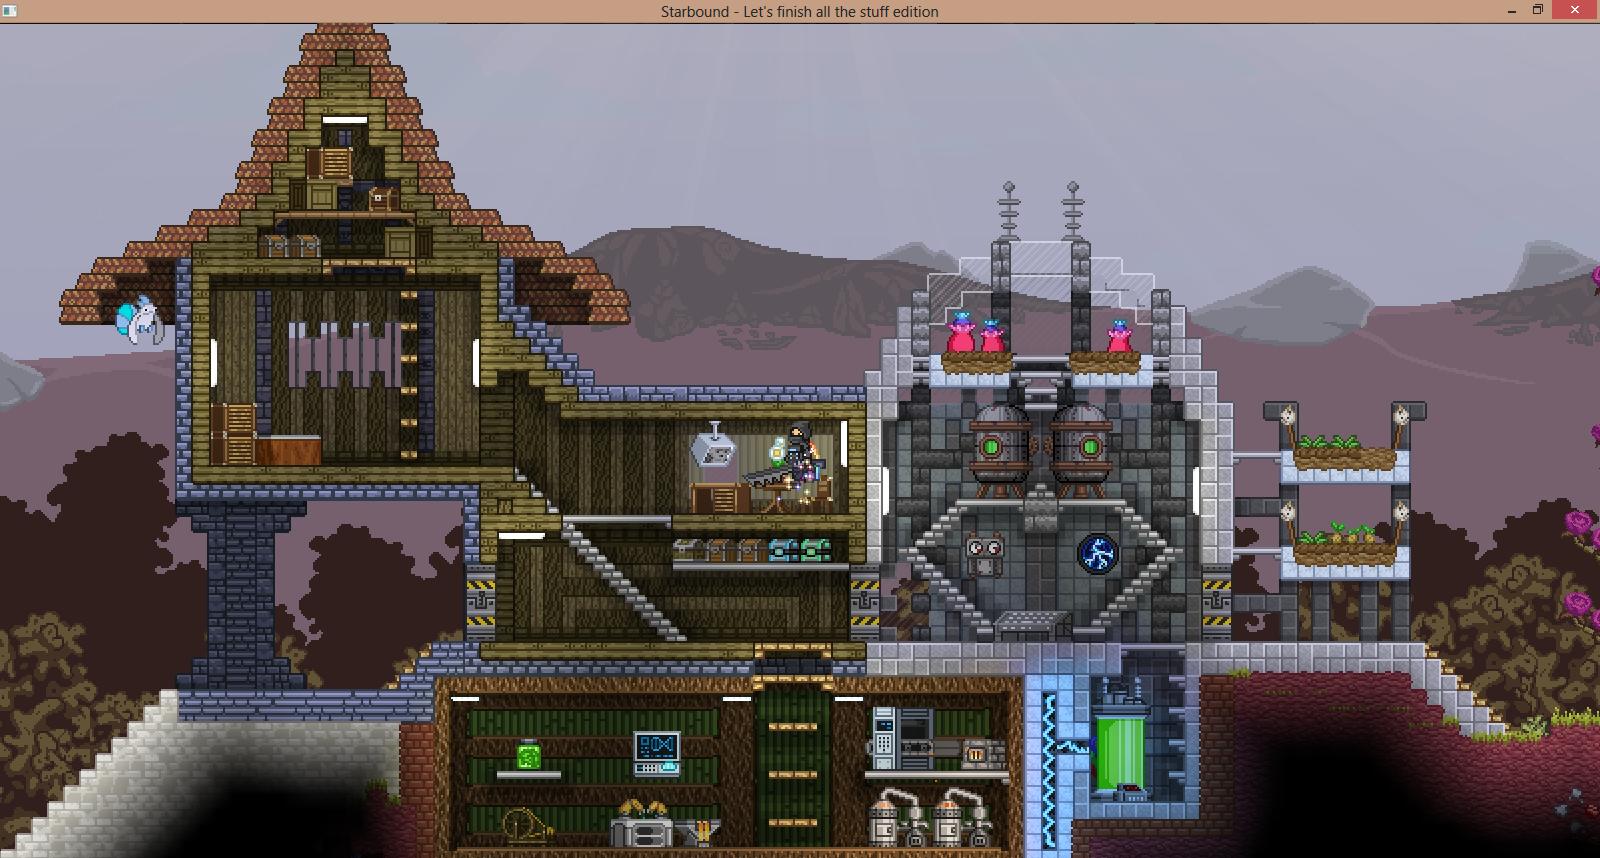 Starbound base-building :o - Imgur